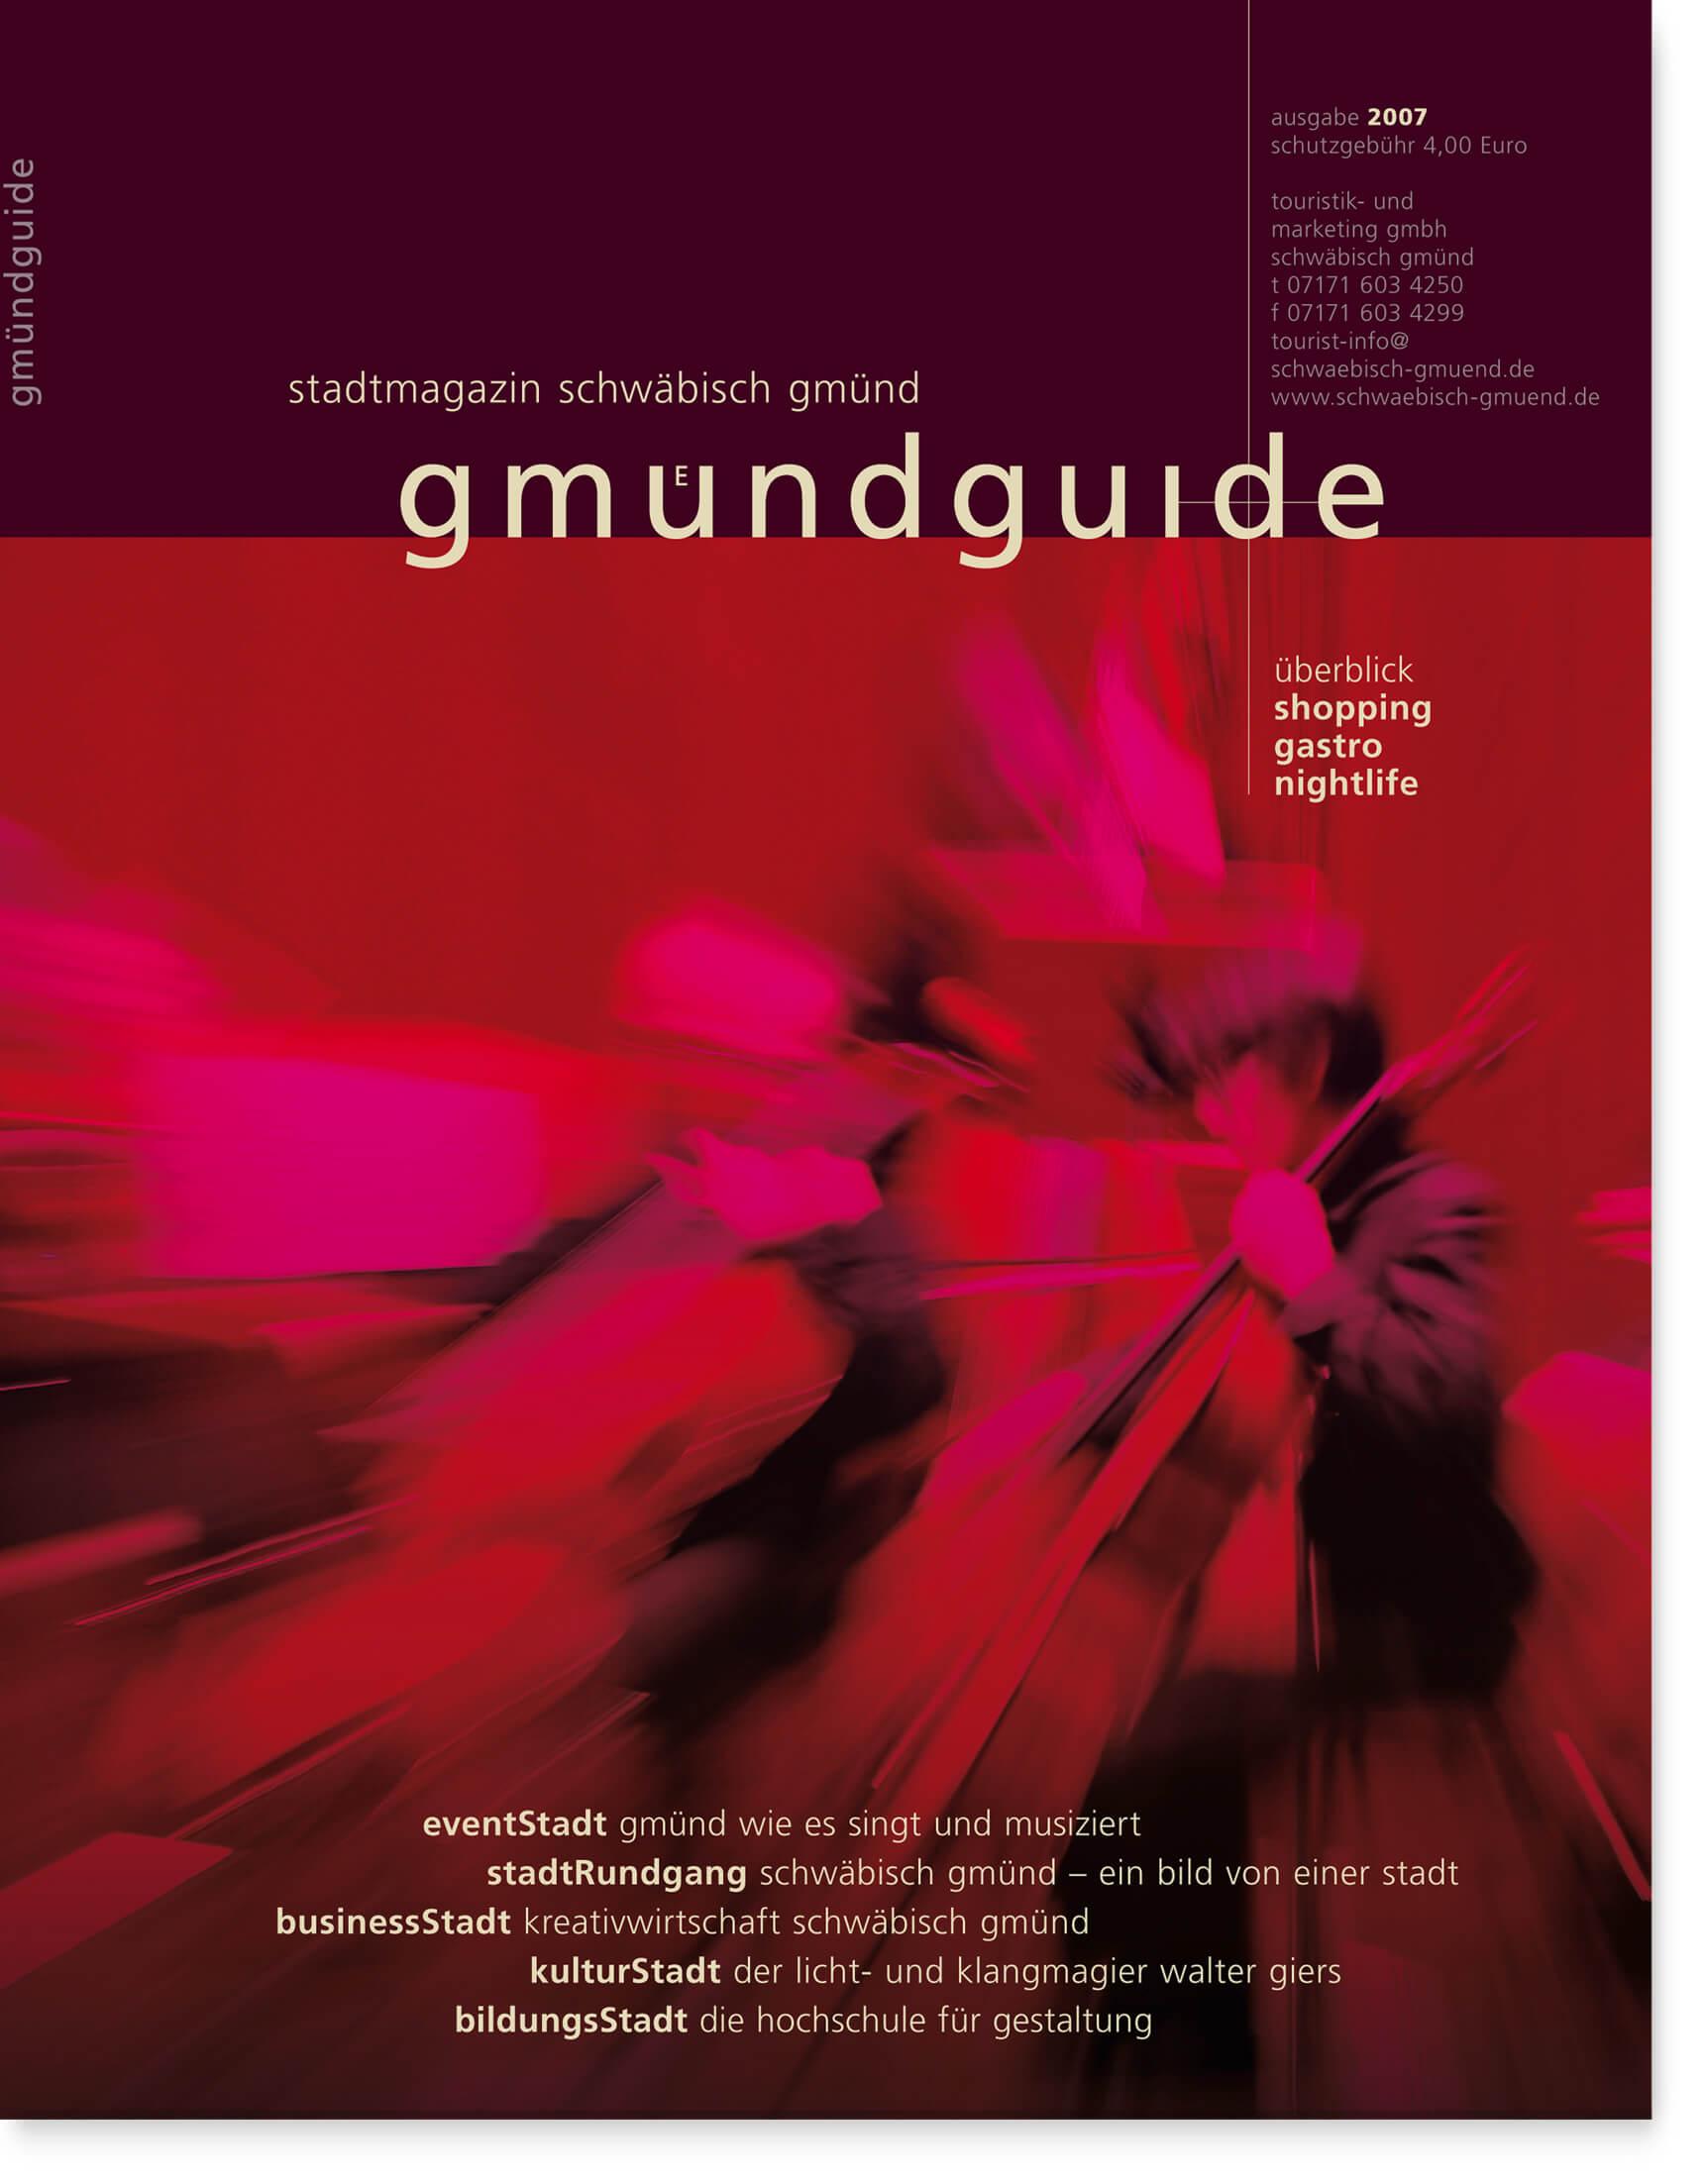 fh-web-gmuendguide-2007-1.jpg